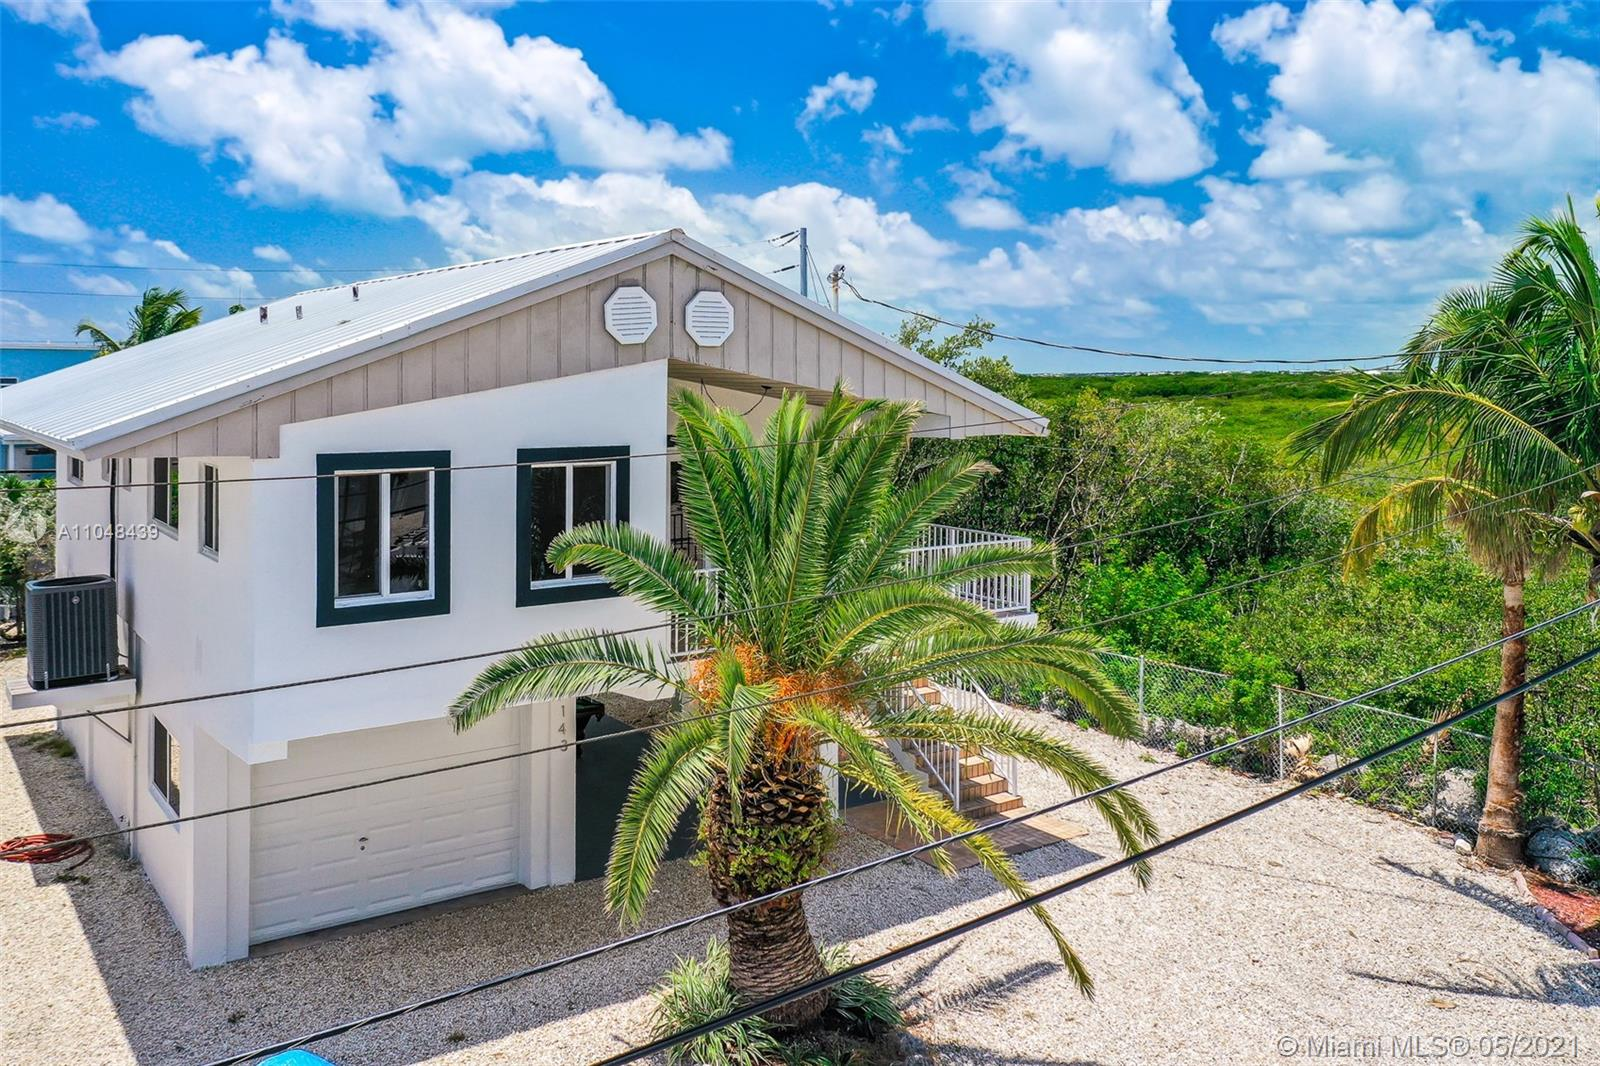 Key Largo Ocean Shores Ad Real Estate Listings Main Image